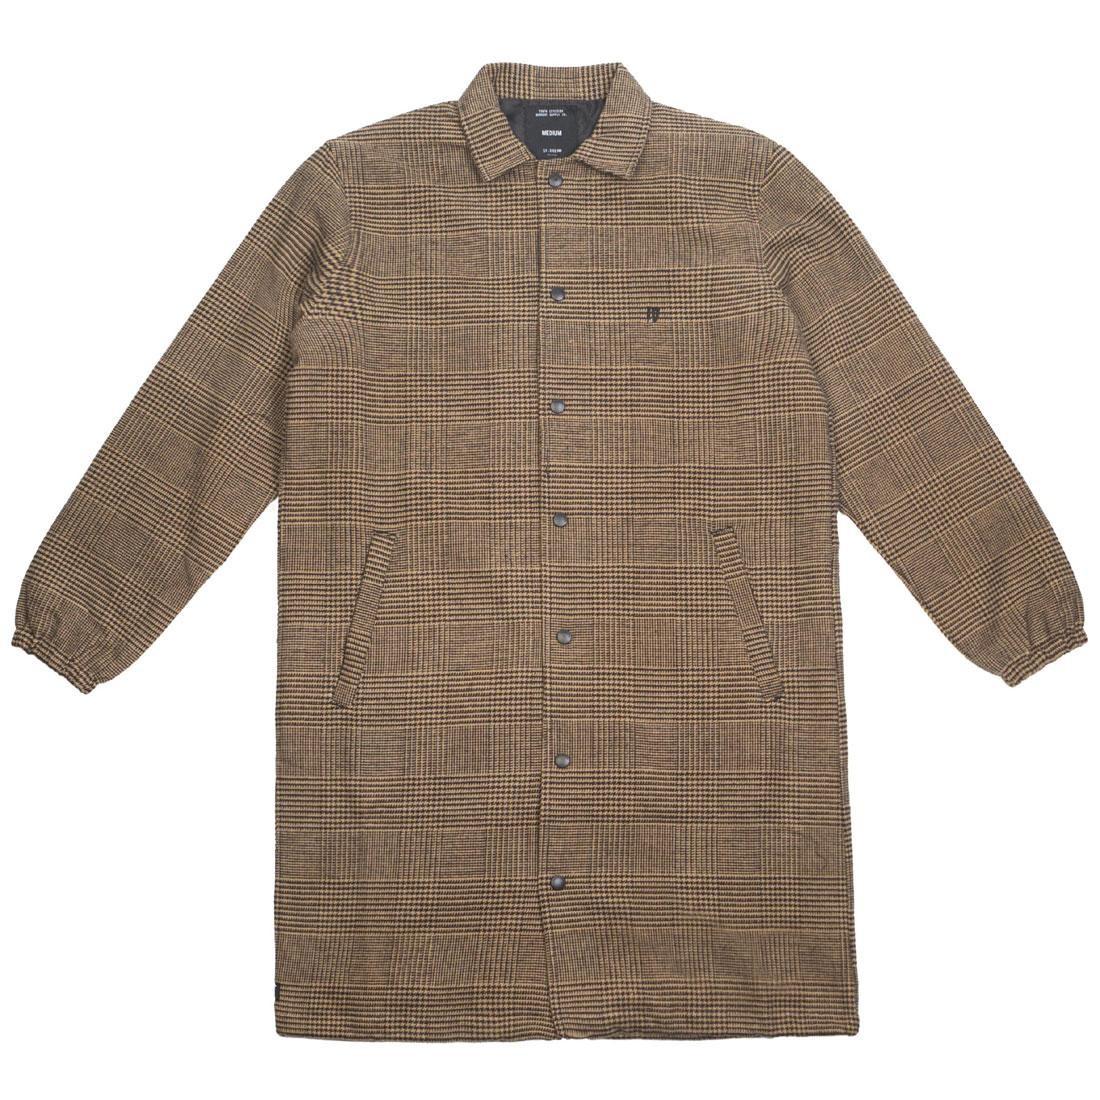 10 Deep Men Streeters Coaches Jacket (brown / tan)